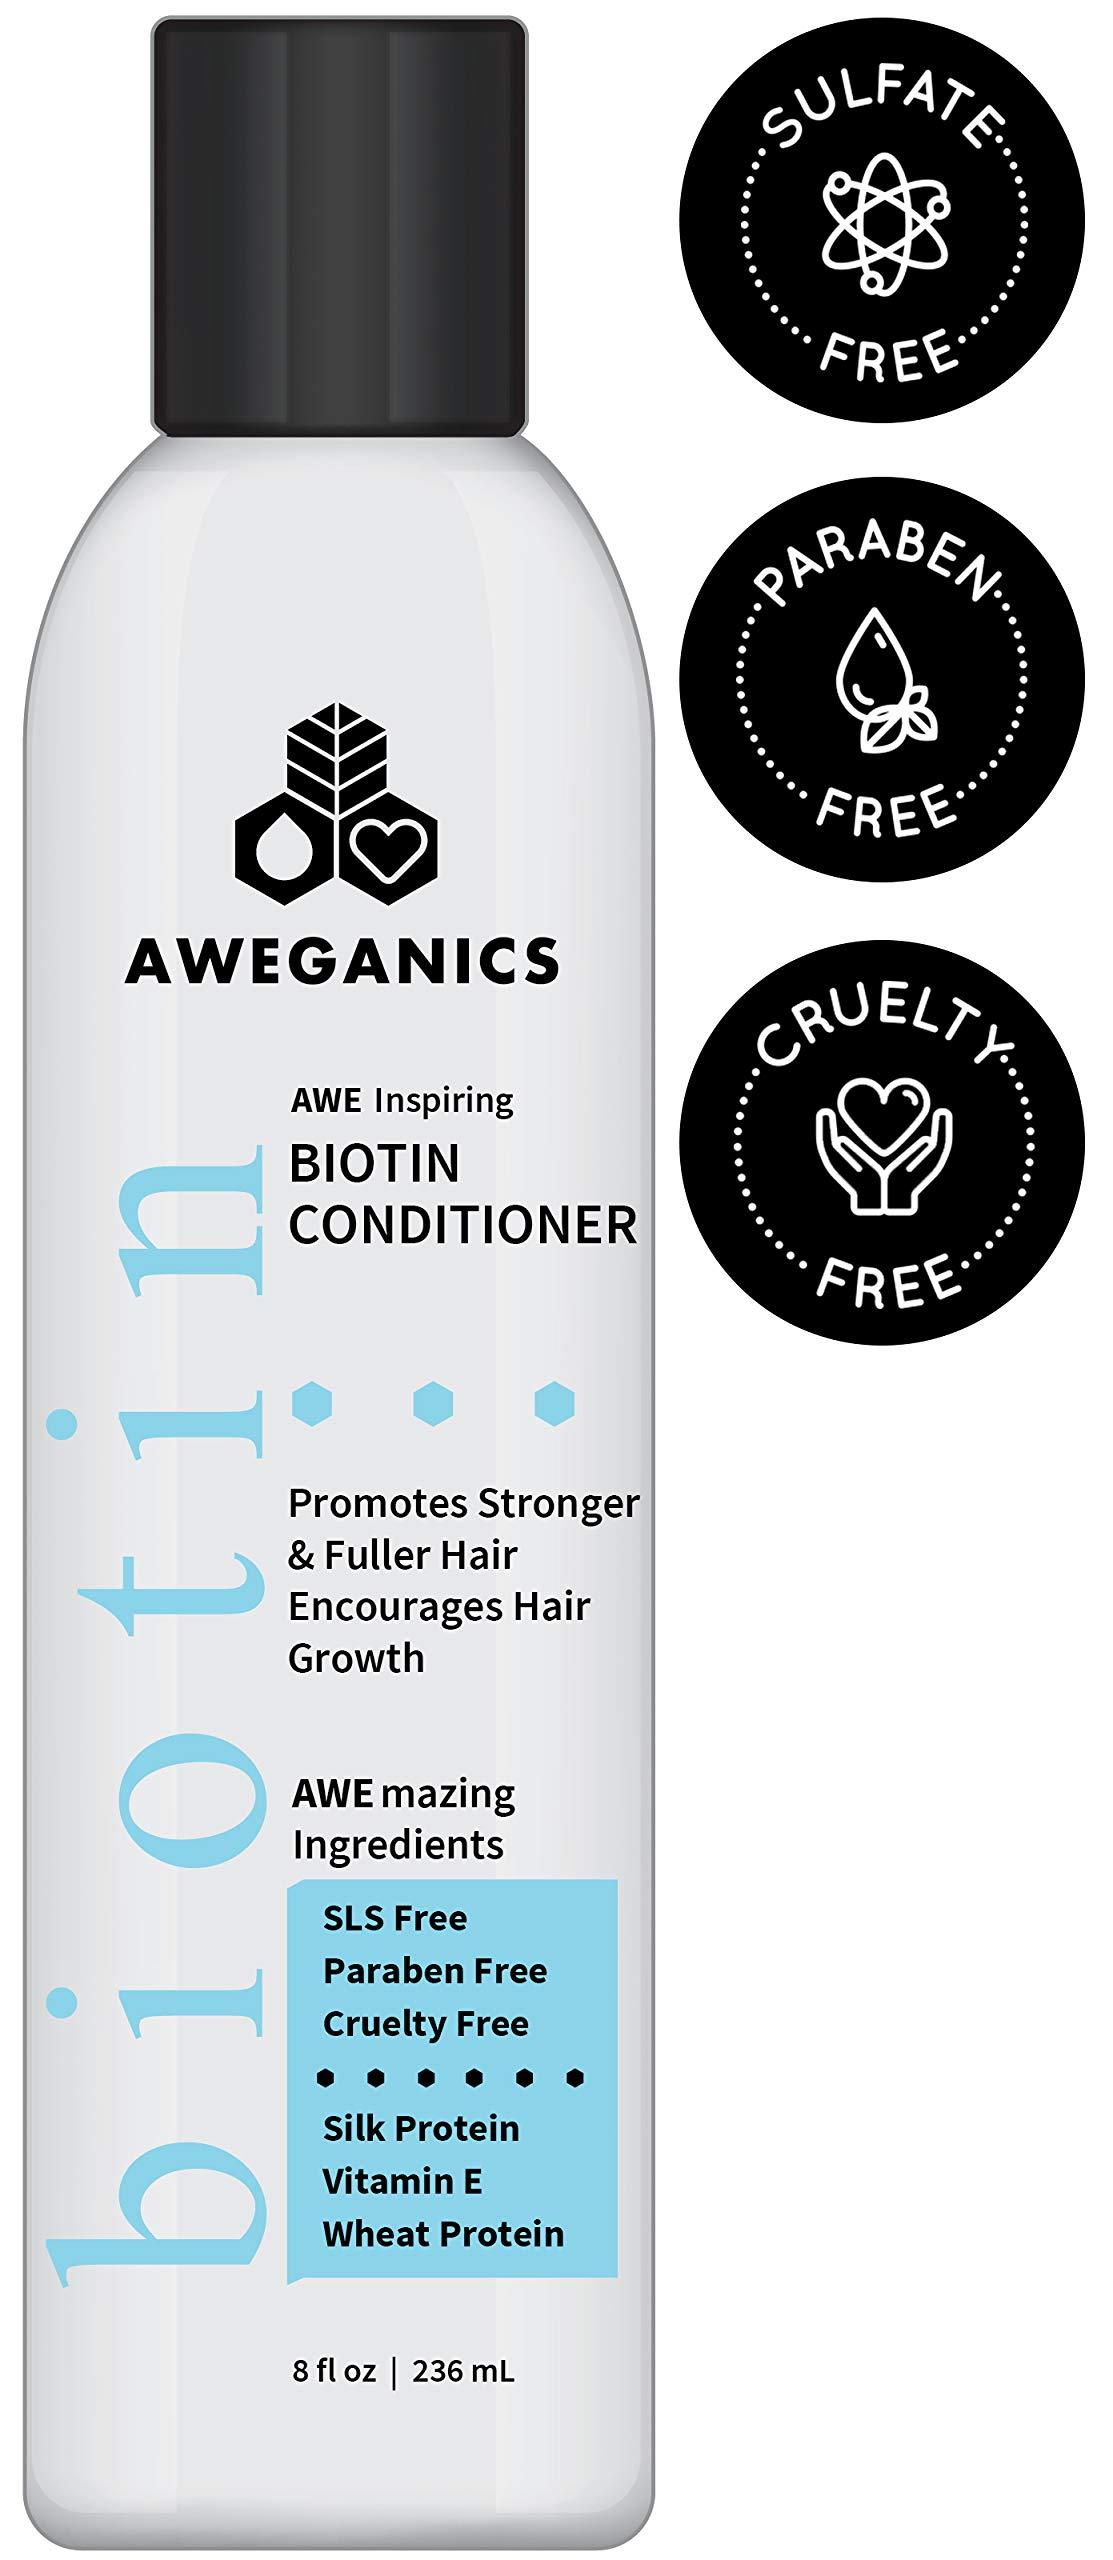 Aweganics Biotin Hair Growth Conditioner, AWE Inspiring Natural Thickening Volumizing Deep Conditioning Treatment for Hair Loss and Thinning Hair - SLS-Free, Paraben-Free, Cruelty-Free, Moisturizing by AWEGANICS